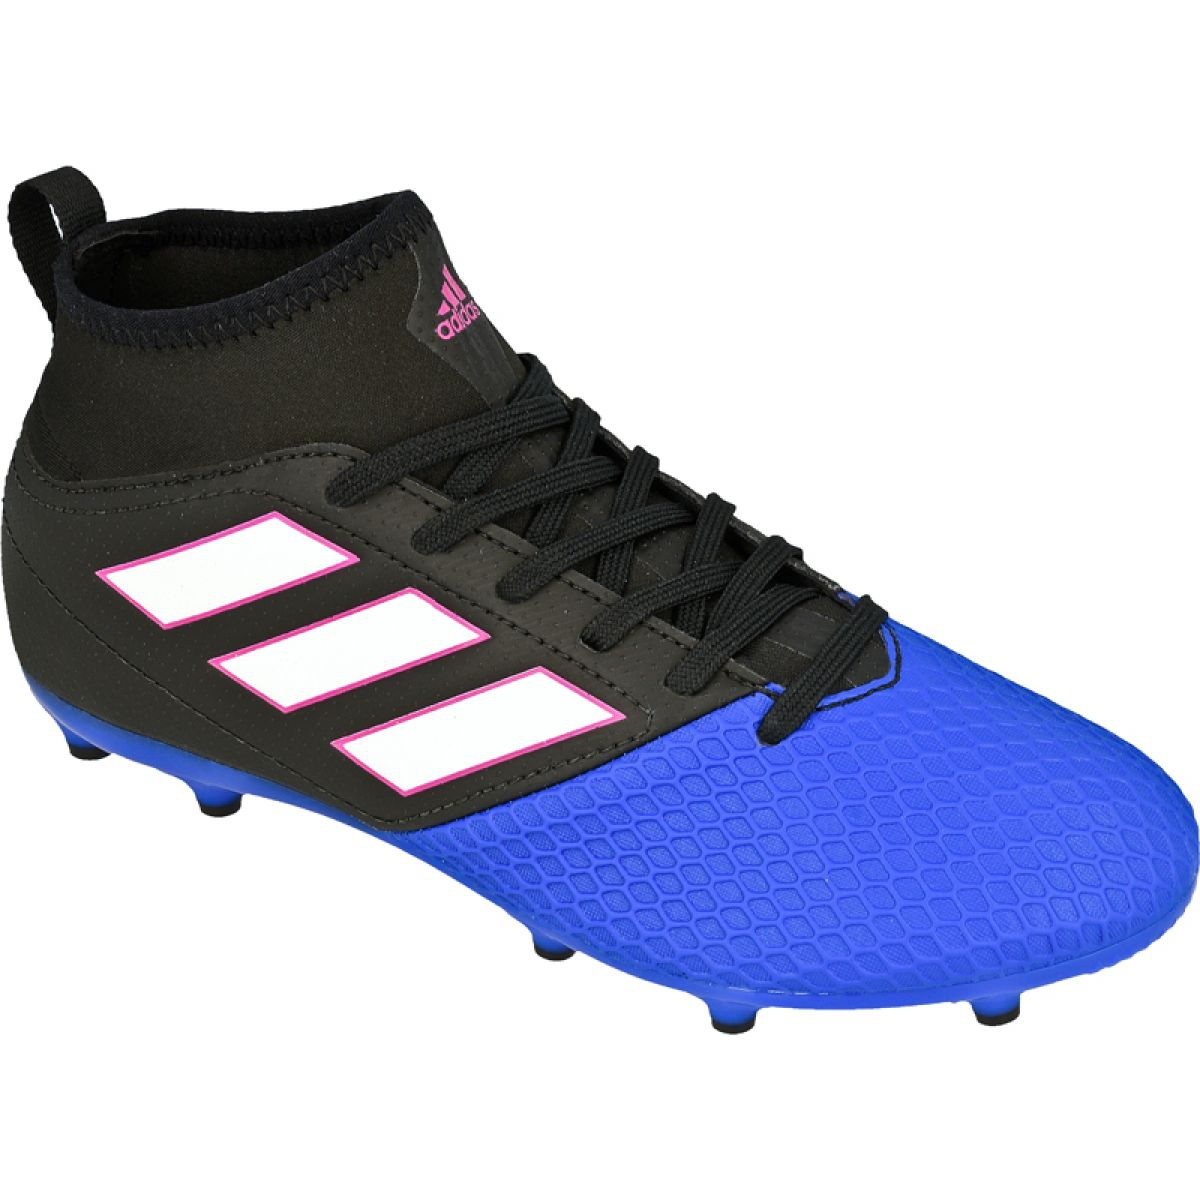 Adidas Ace 17.3 Fg Jr BA9234 chuteiras preto, azul preto